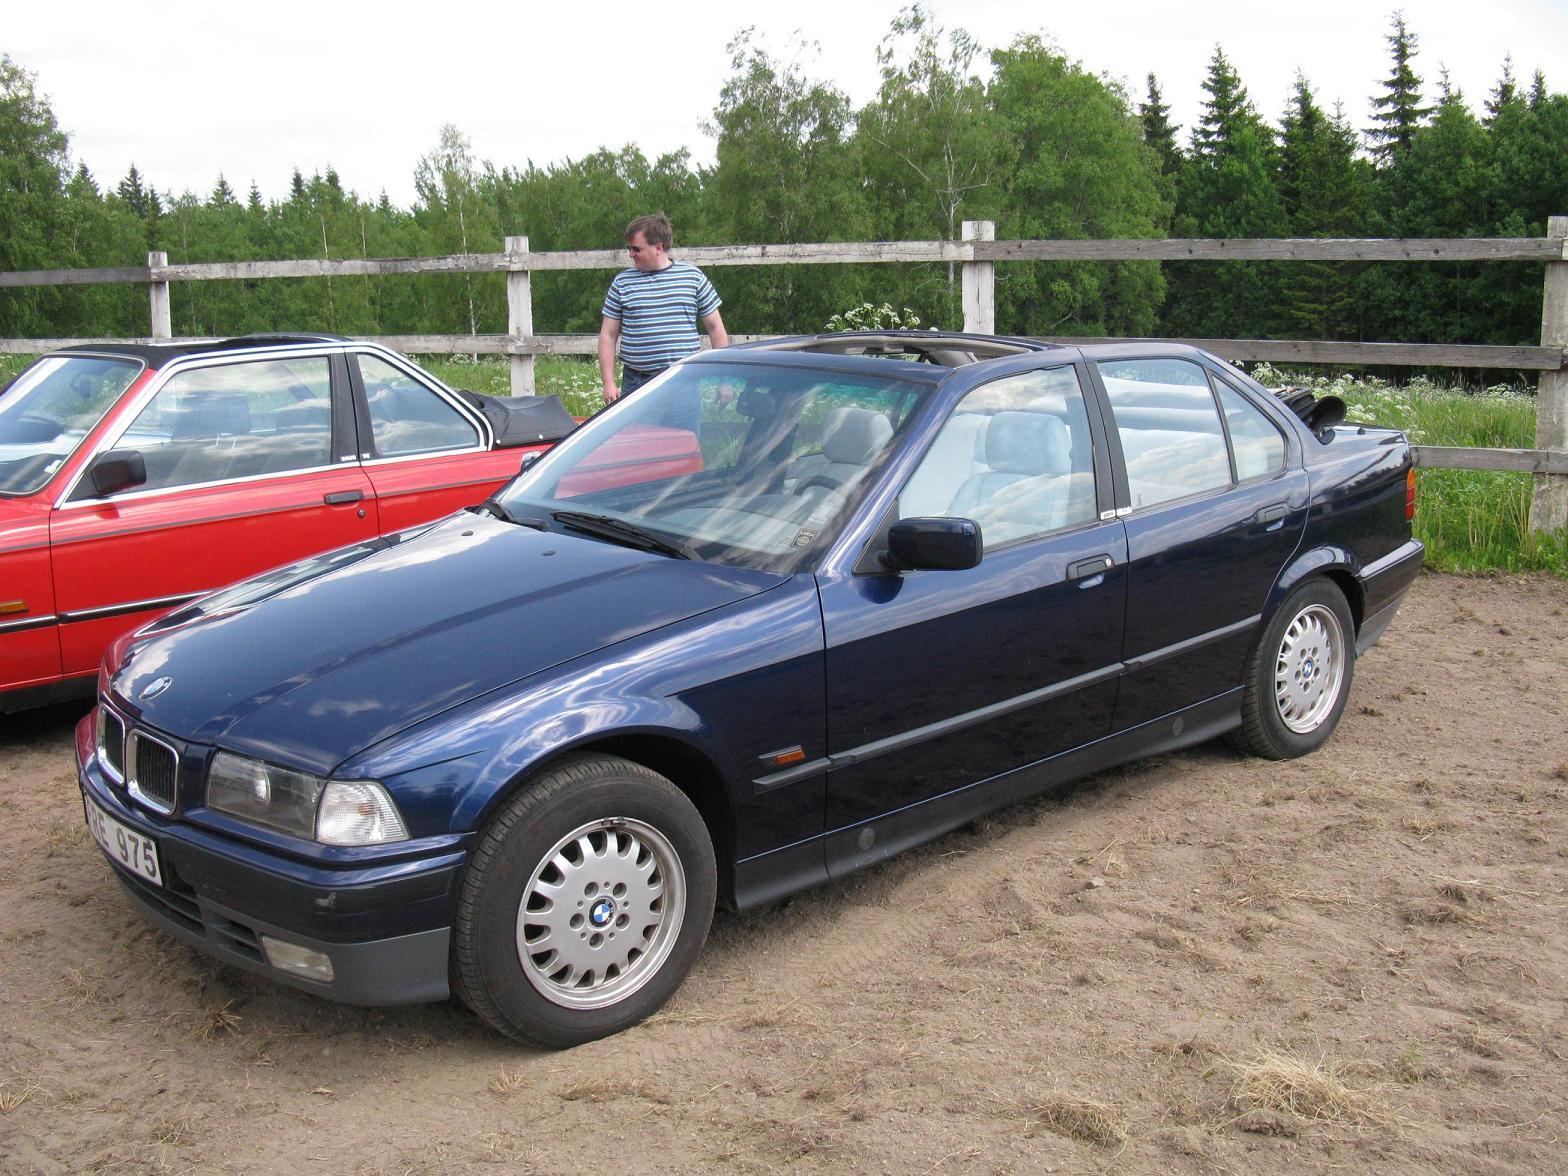 Filebmw 325i Baur Cabriolet E36 5917922641jpg Wikimedia Commons